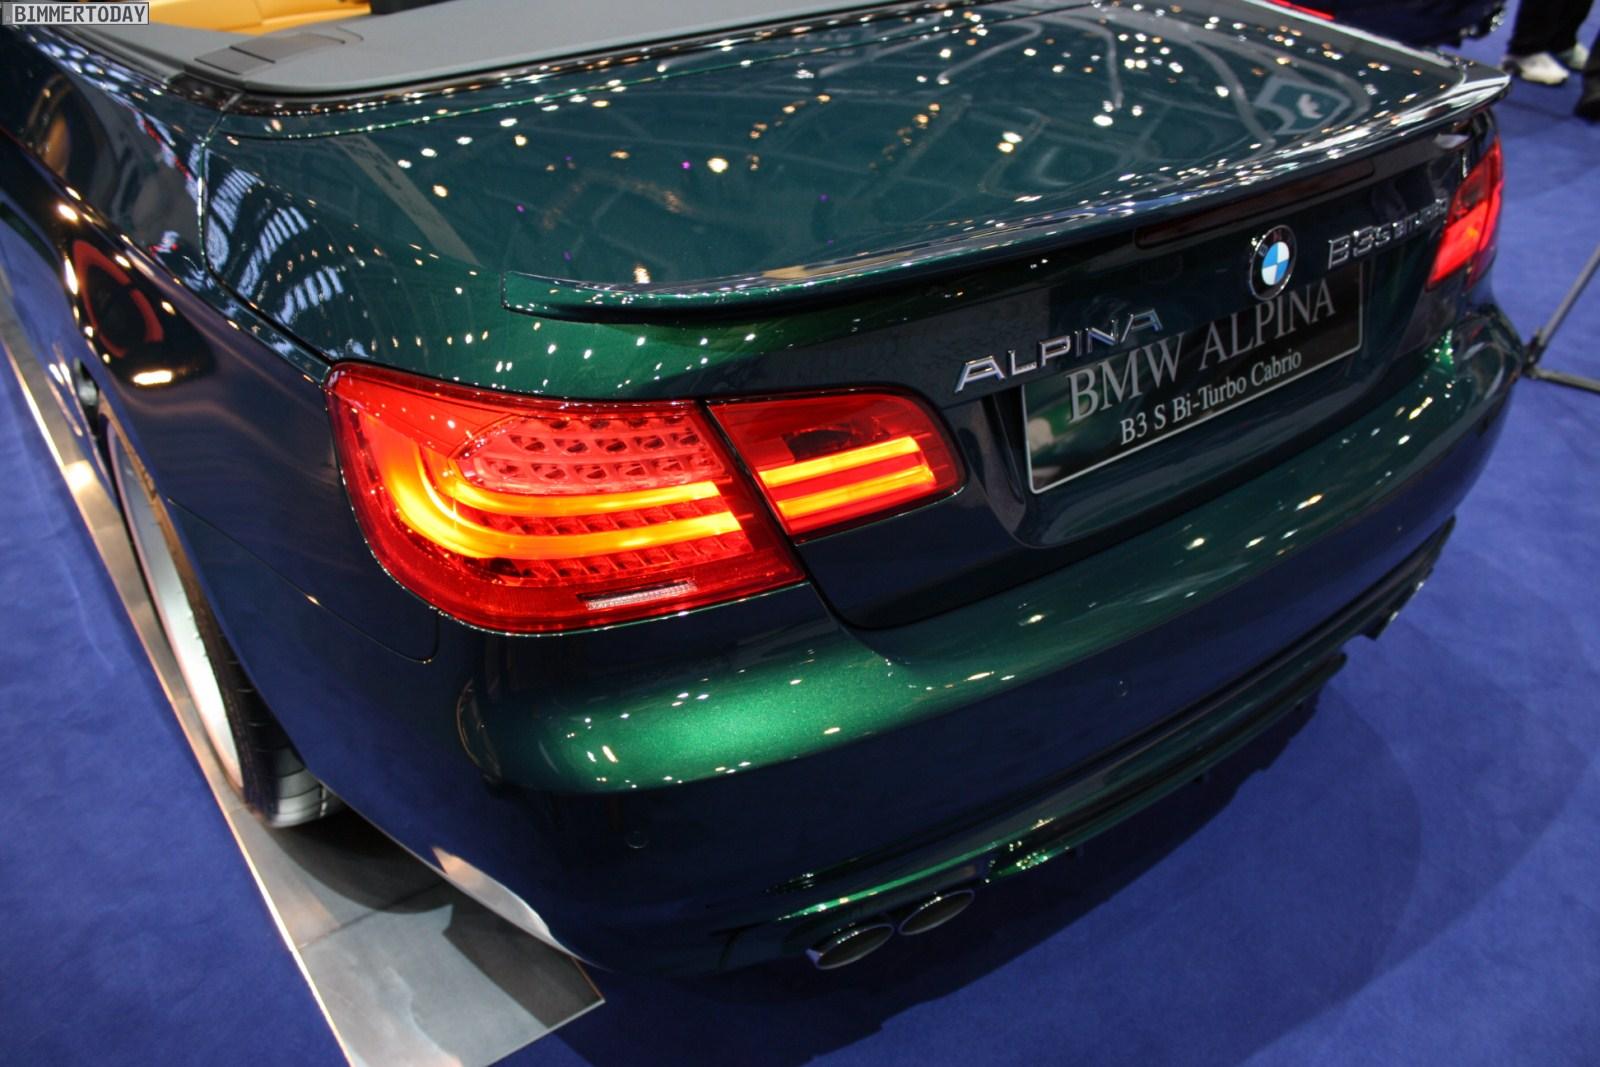 bmw-alpina-b3s-biturbo-cabrio-genf-2011-12